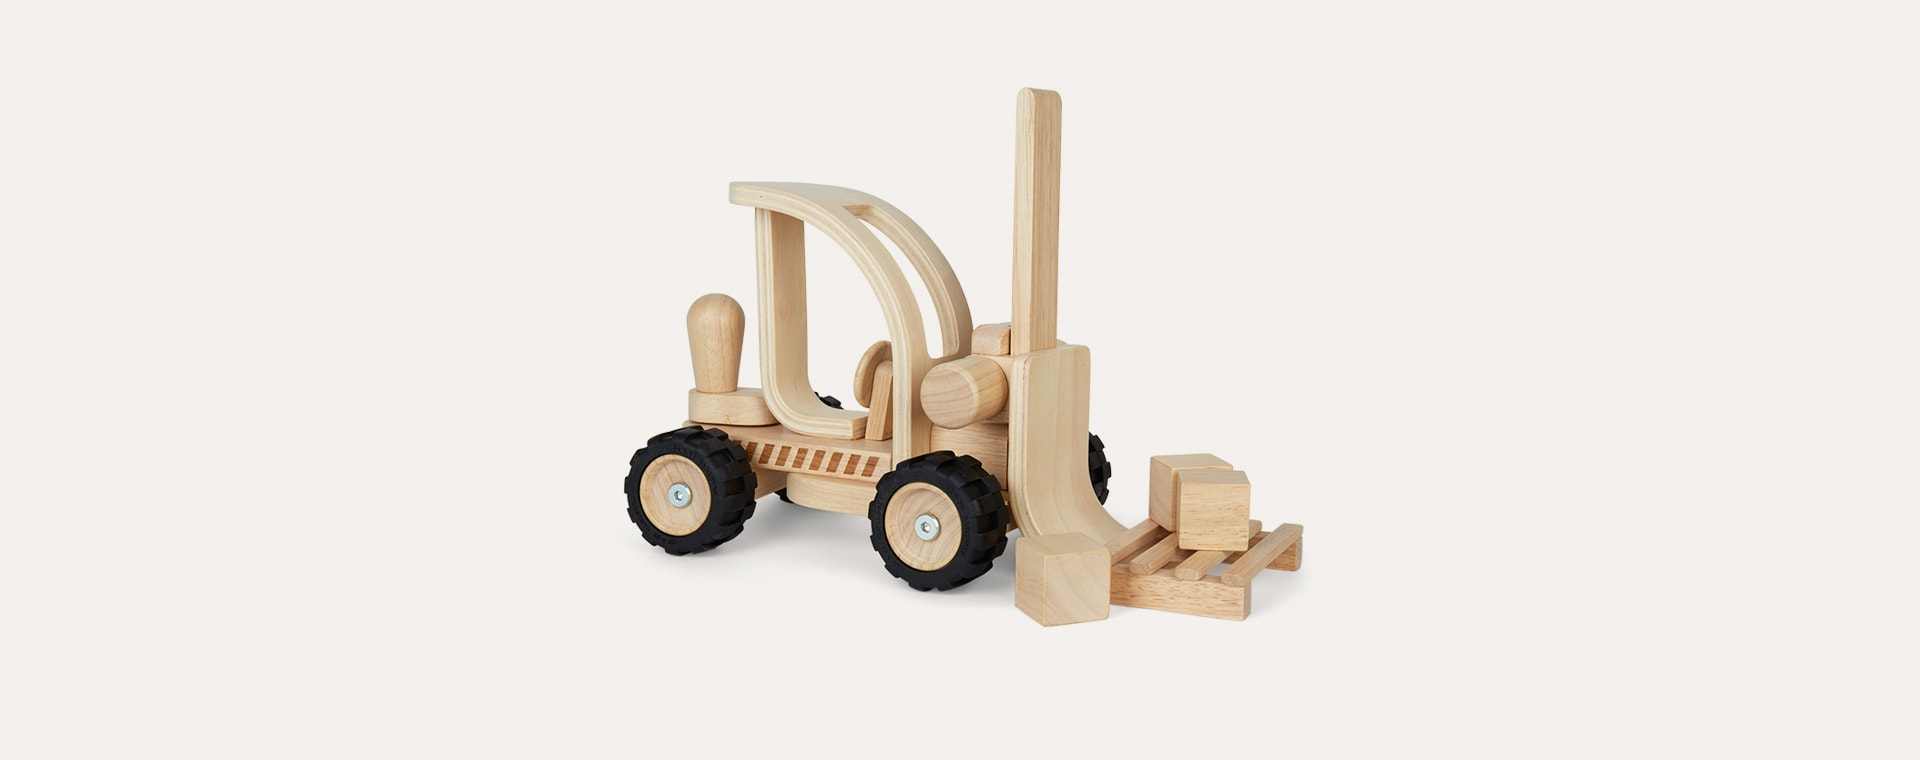 Neutral Plan Toys Forklift